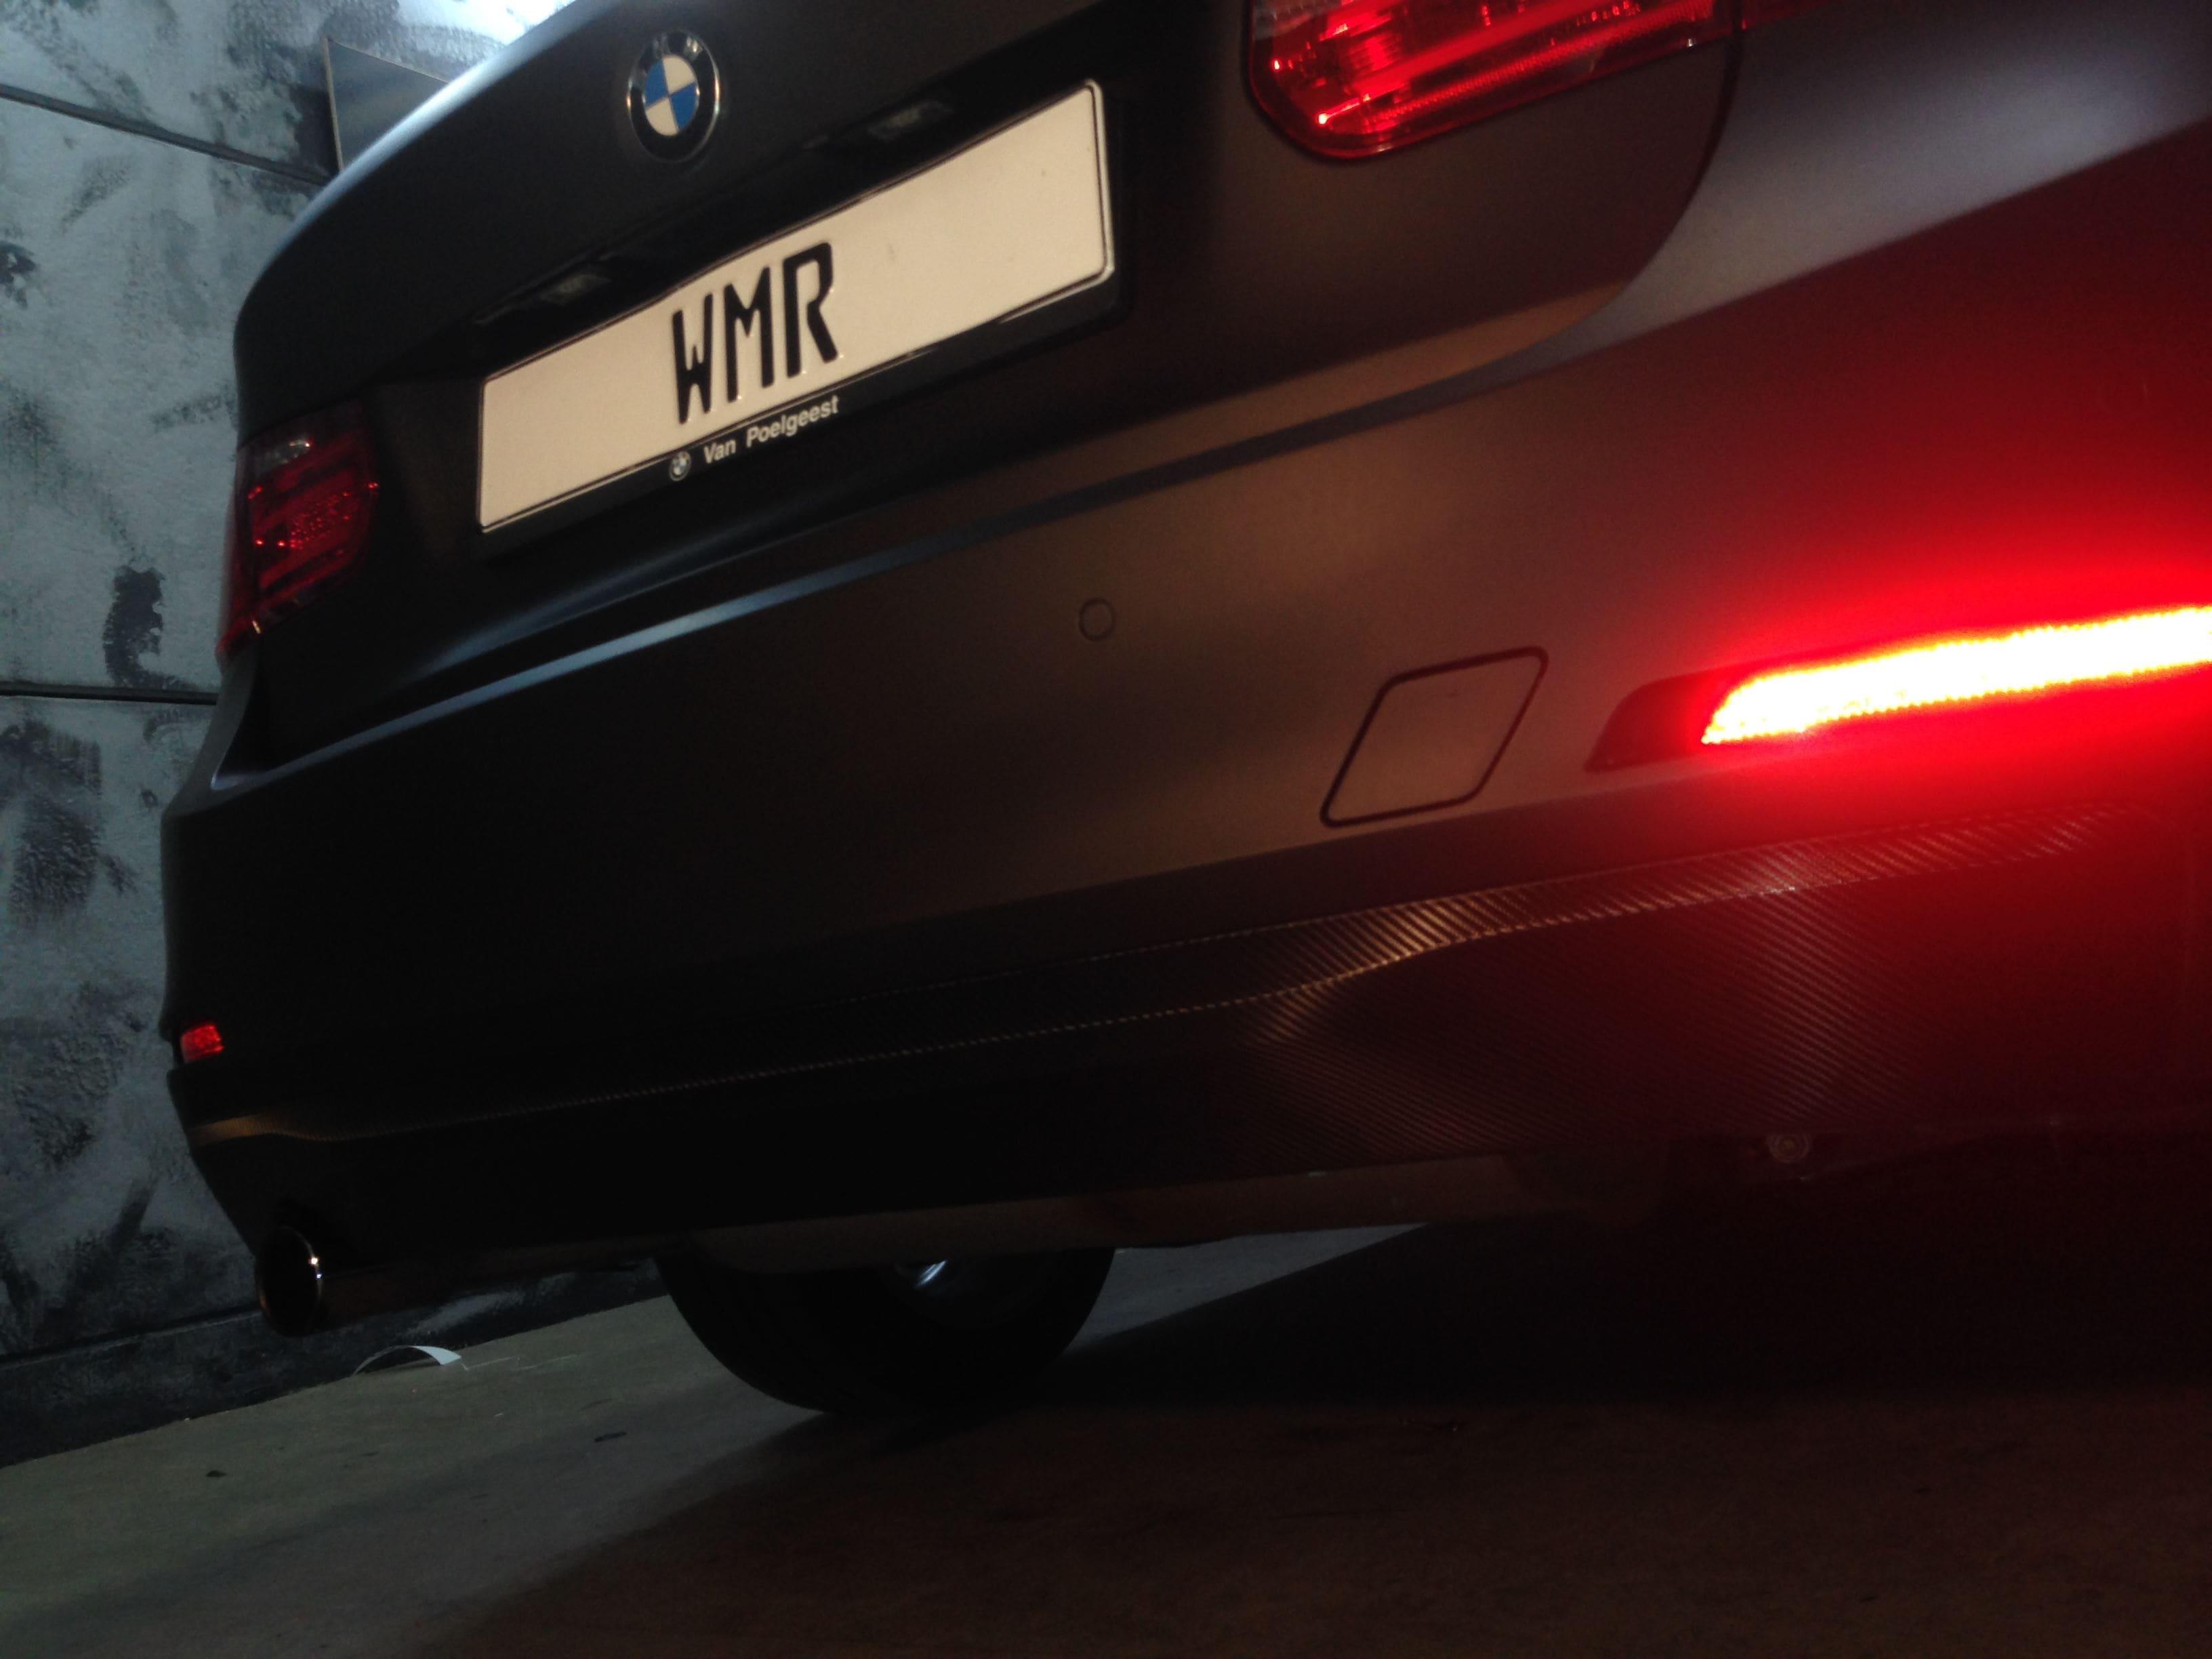 BMW E92 3 Serie met Mat Zwarte Wrap, Carwrapping door Wrapmyride.nu Foto-nr:5417, ©2020